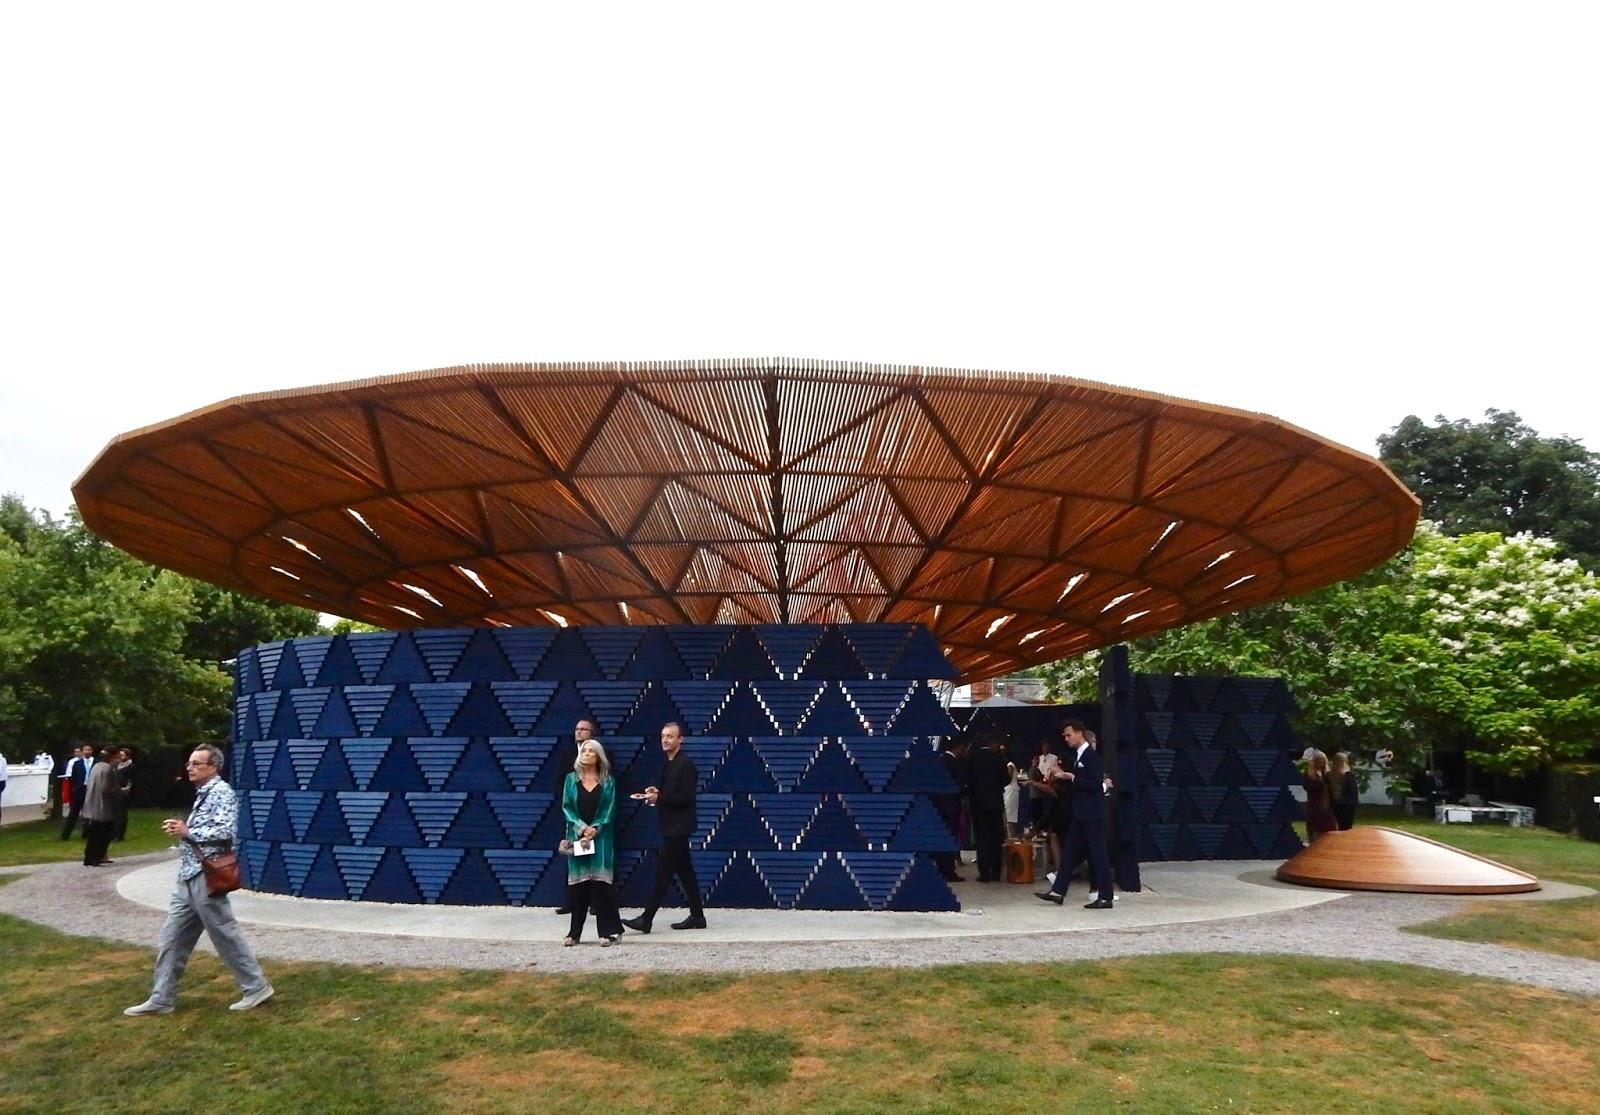 Pavillon Regendicht Galerie : Party pavillon interesting zelt with